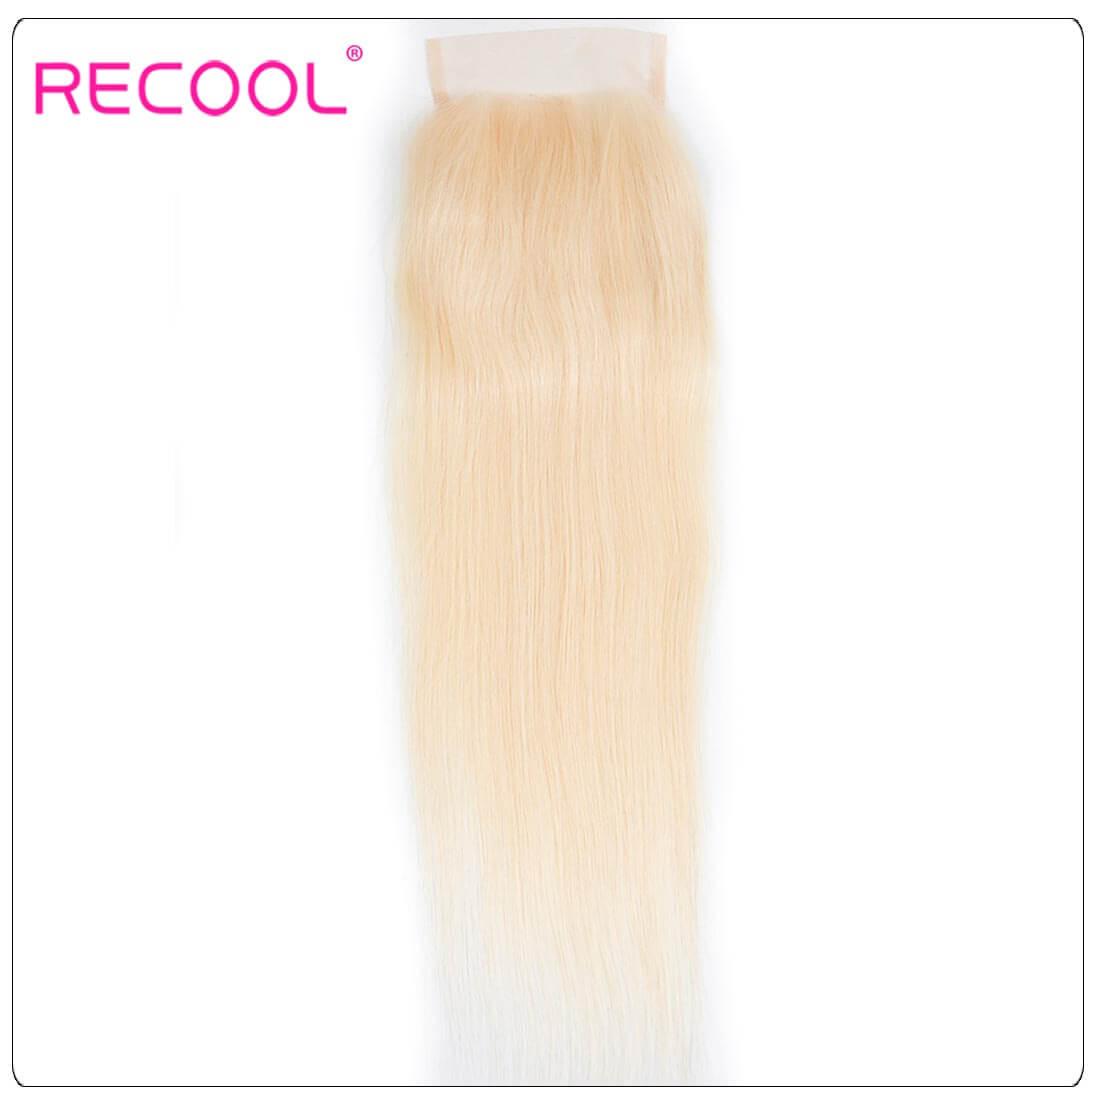 Virgin Human Hair 613 Blonde Straight hair,613 Blonde Straight Lace Closure